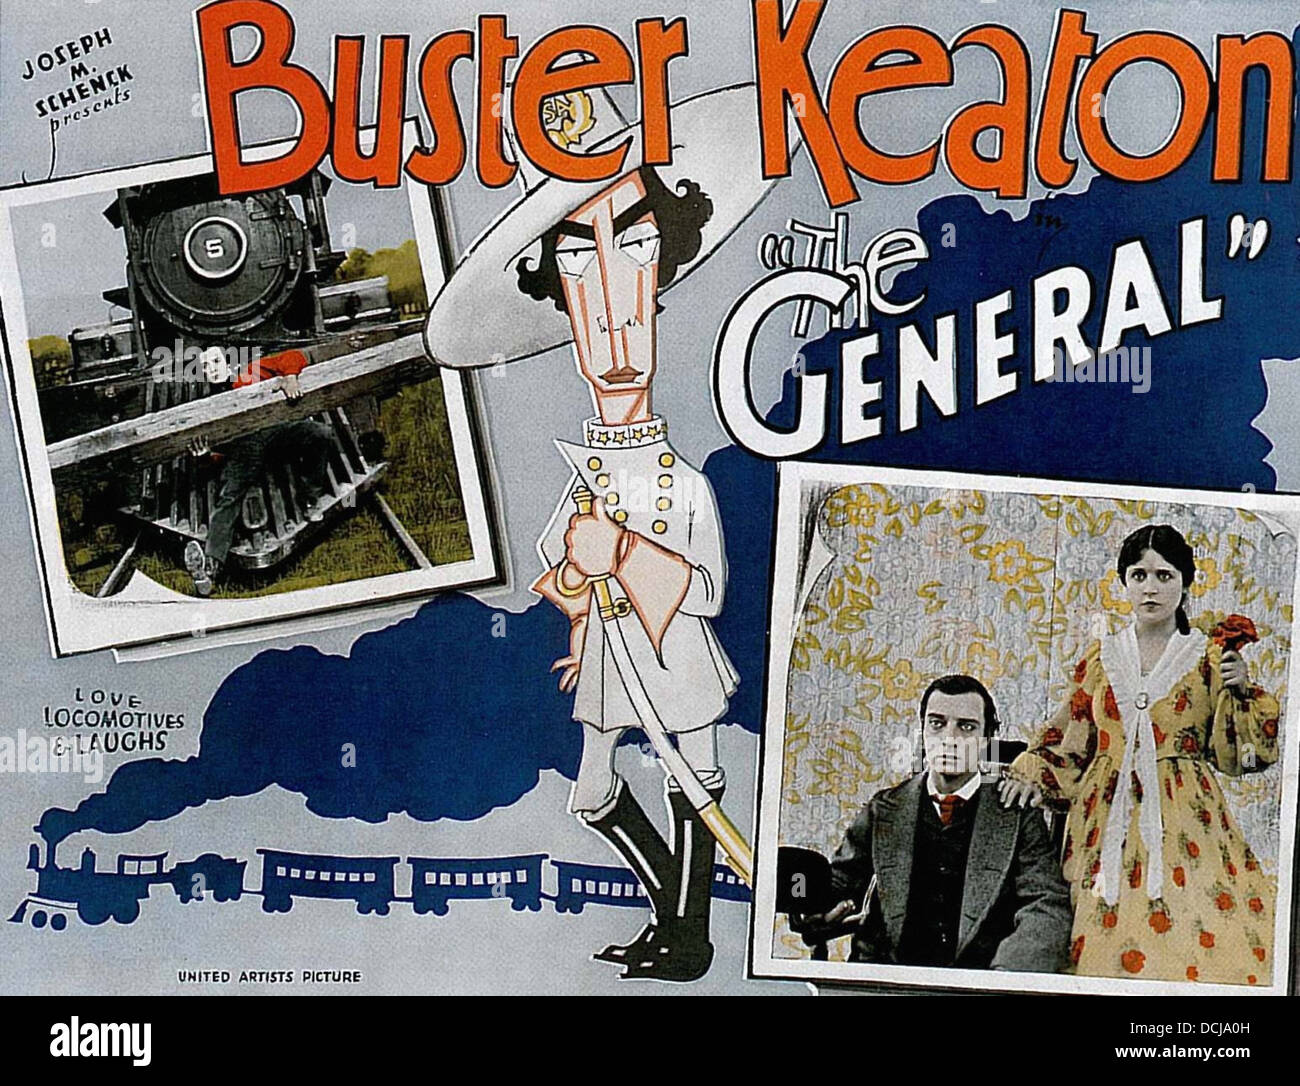 Das GENERAL - Buster Keaton Produktionen 1927 - Filmplakat Stockbild